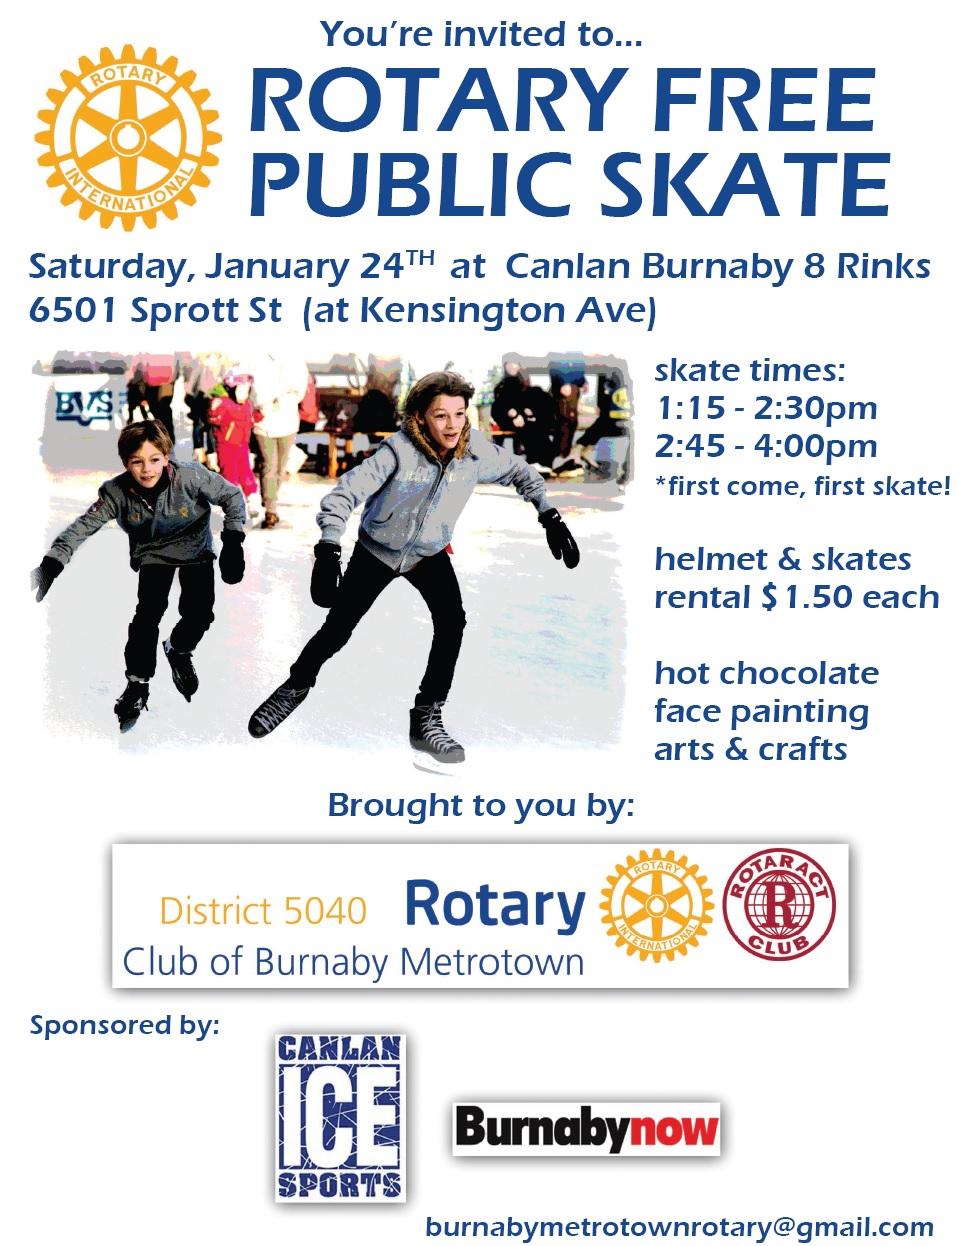 Rotary-free-public-skate